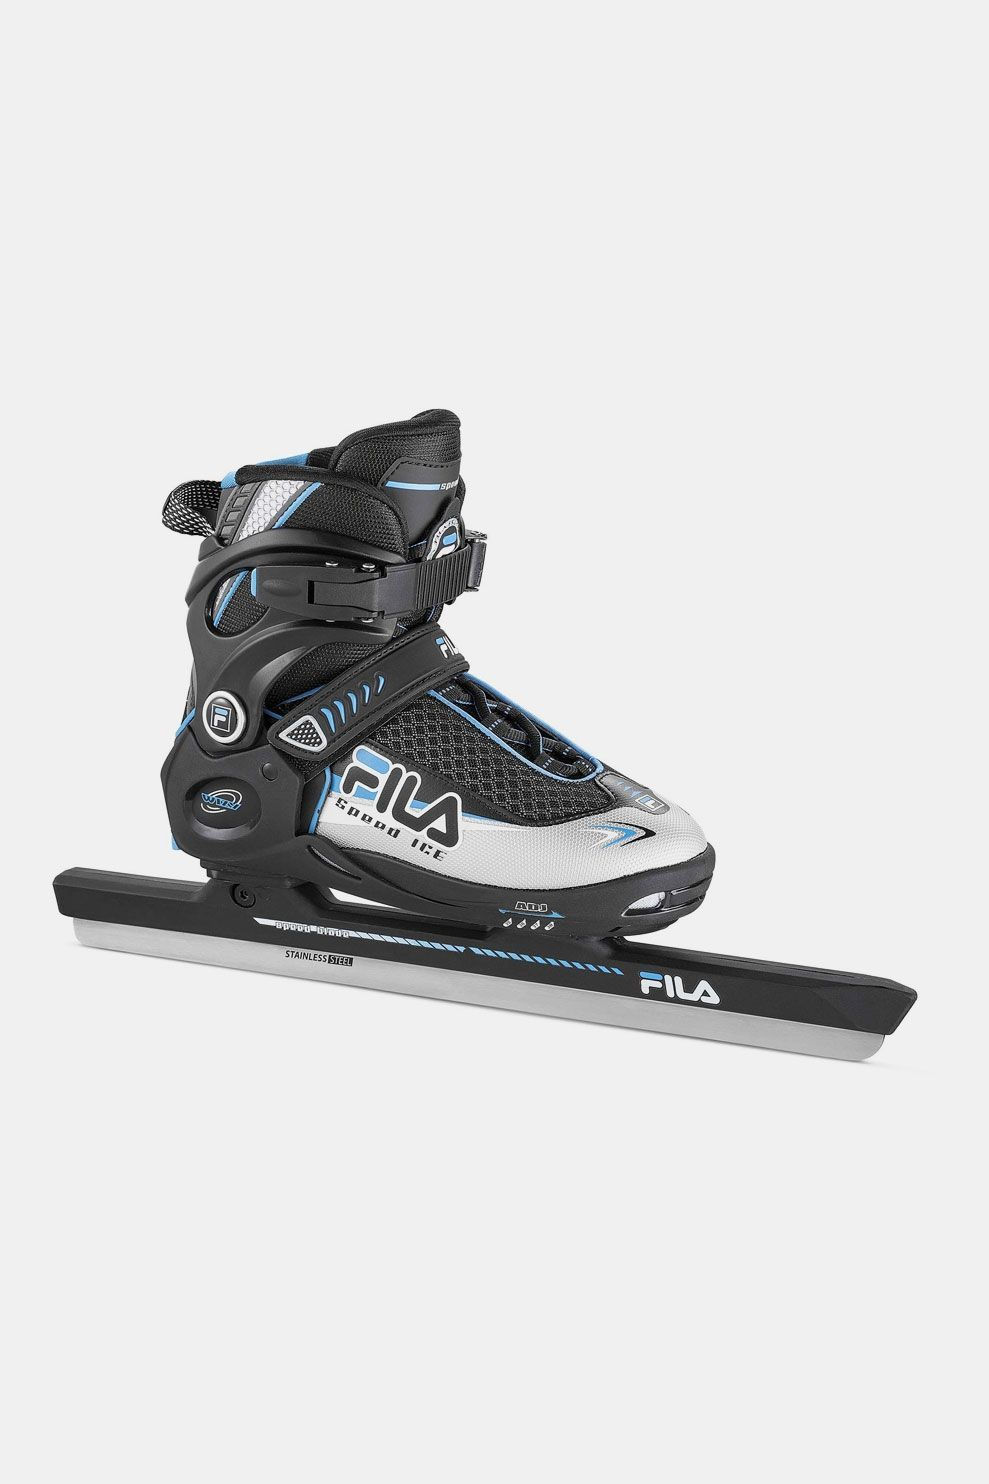 Fila Wizy Ice Speed Schaats Zwart/Blauw